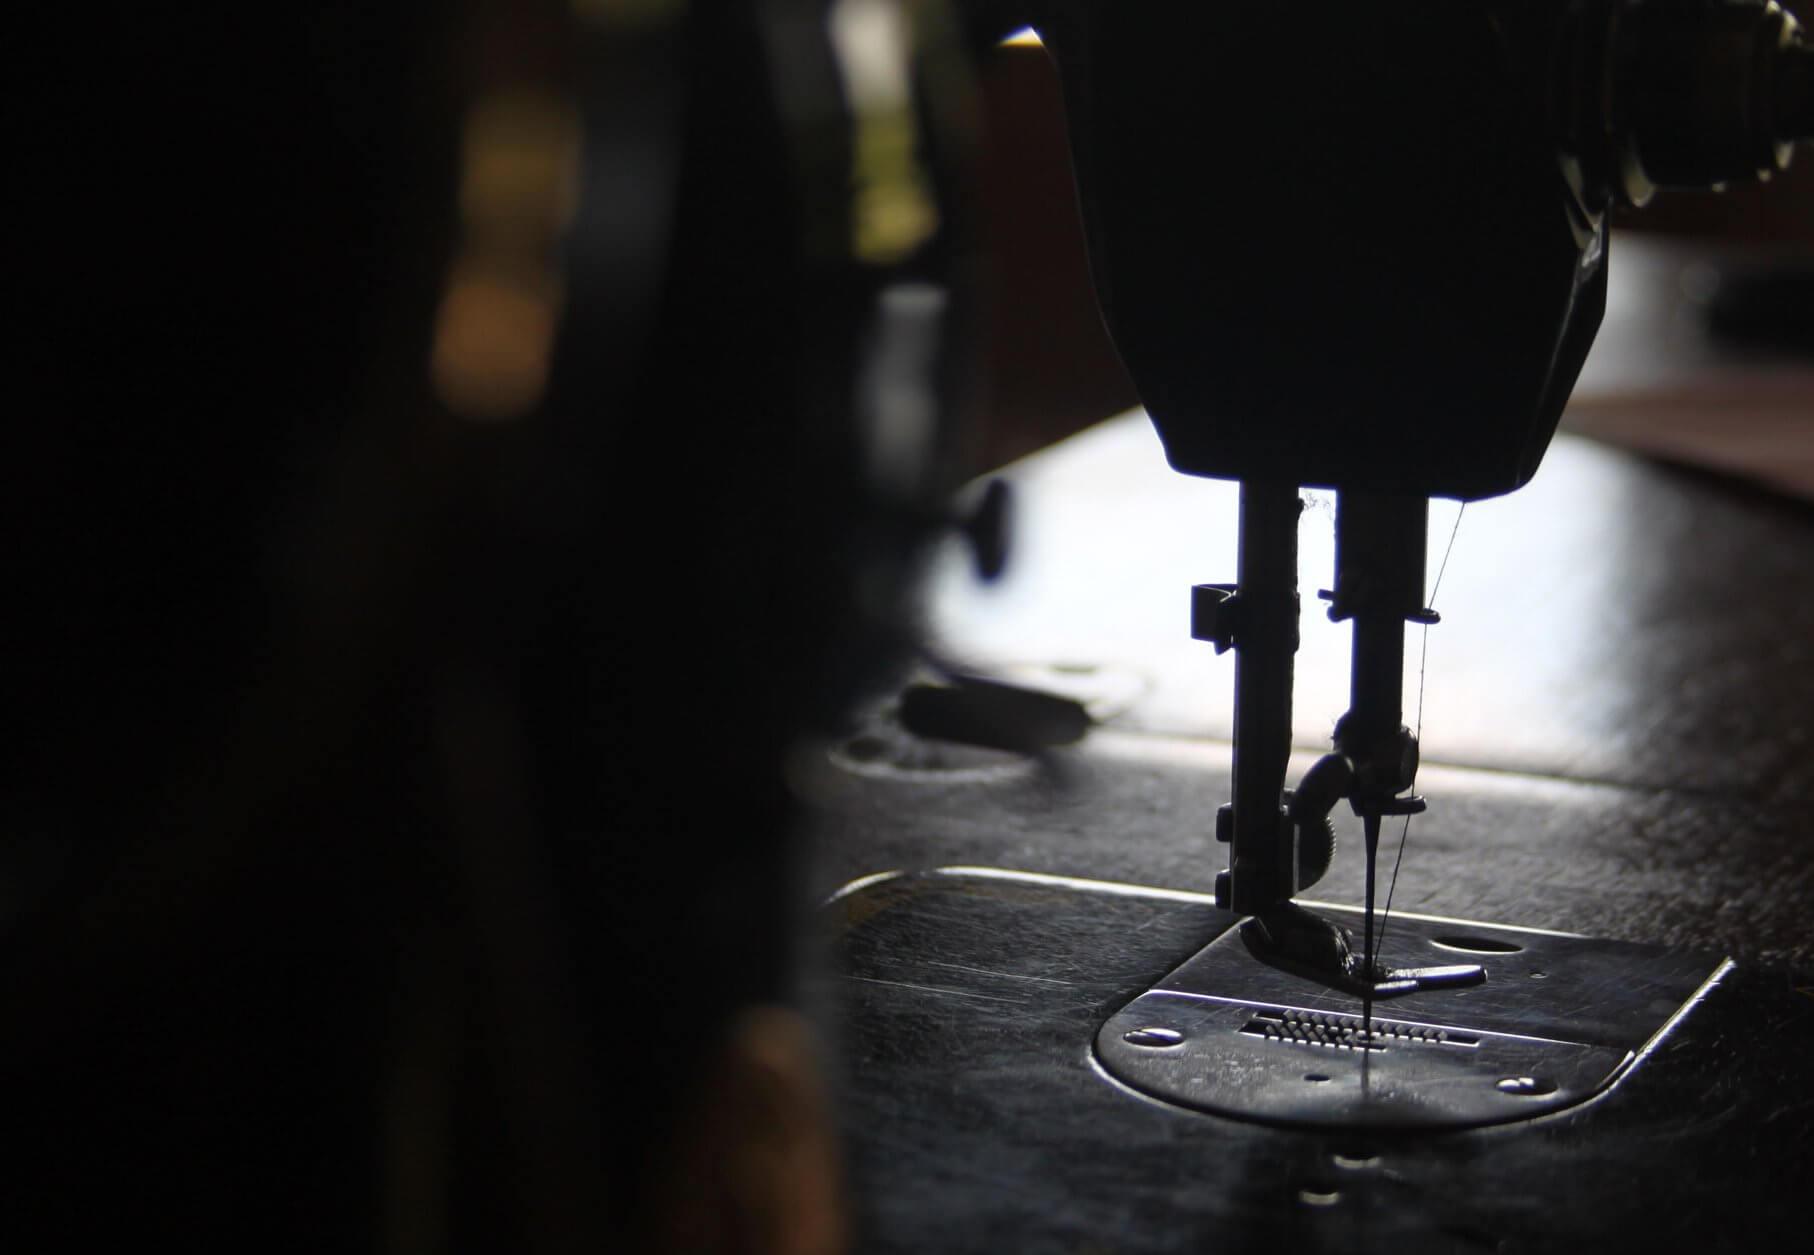 Narry bespoke tailors